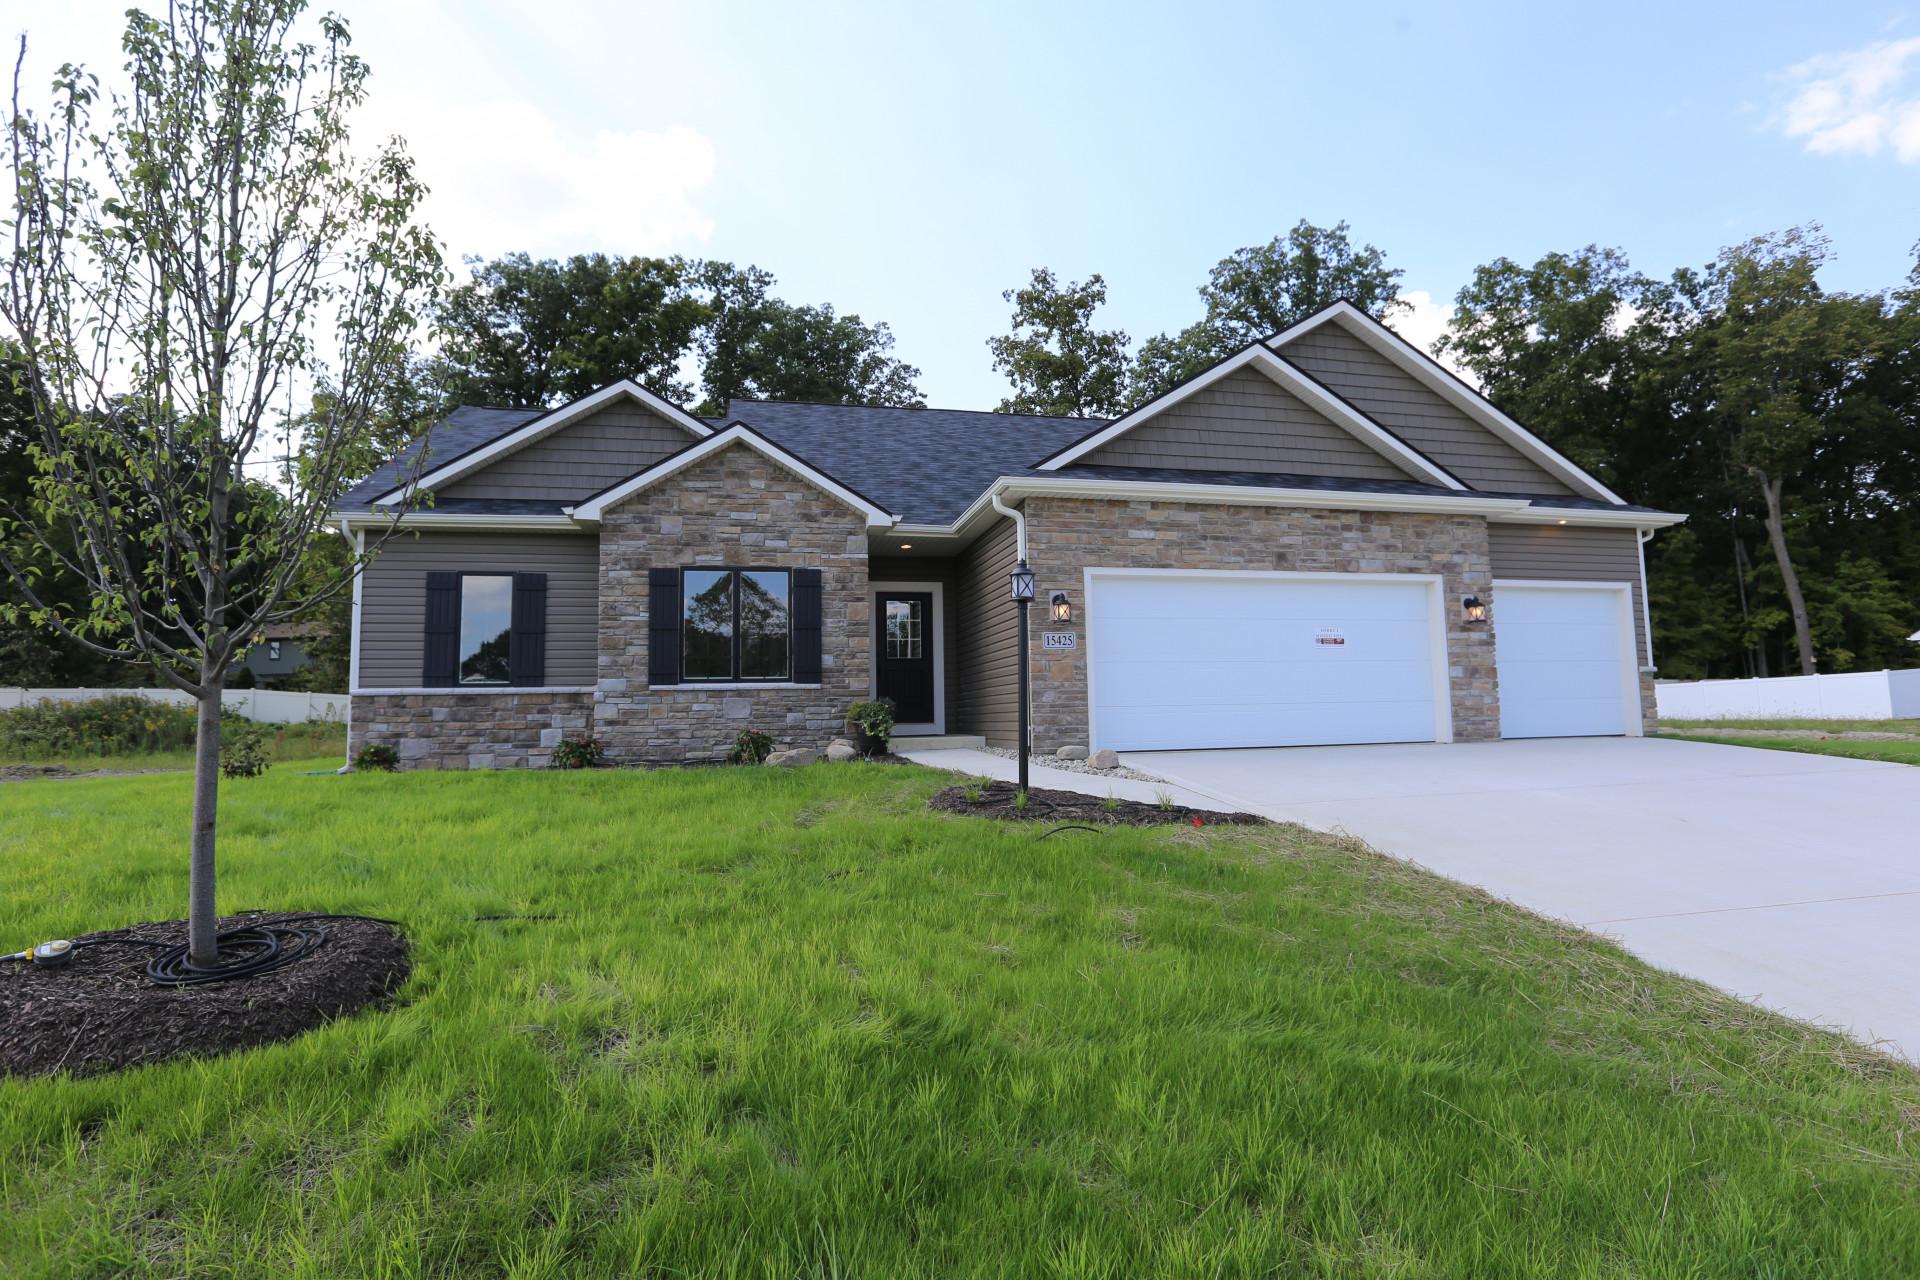 15425 Canyon Bay Run Hba Fort Wayne Homes For Sale Adams Allen